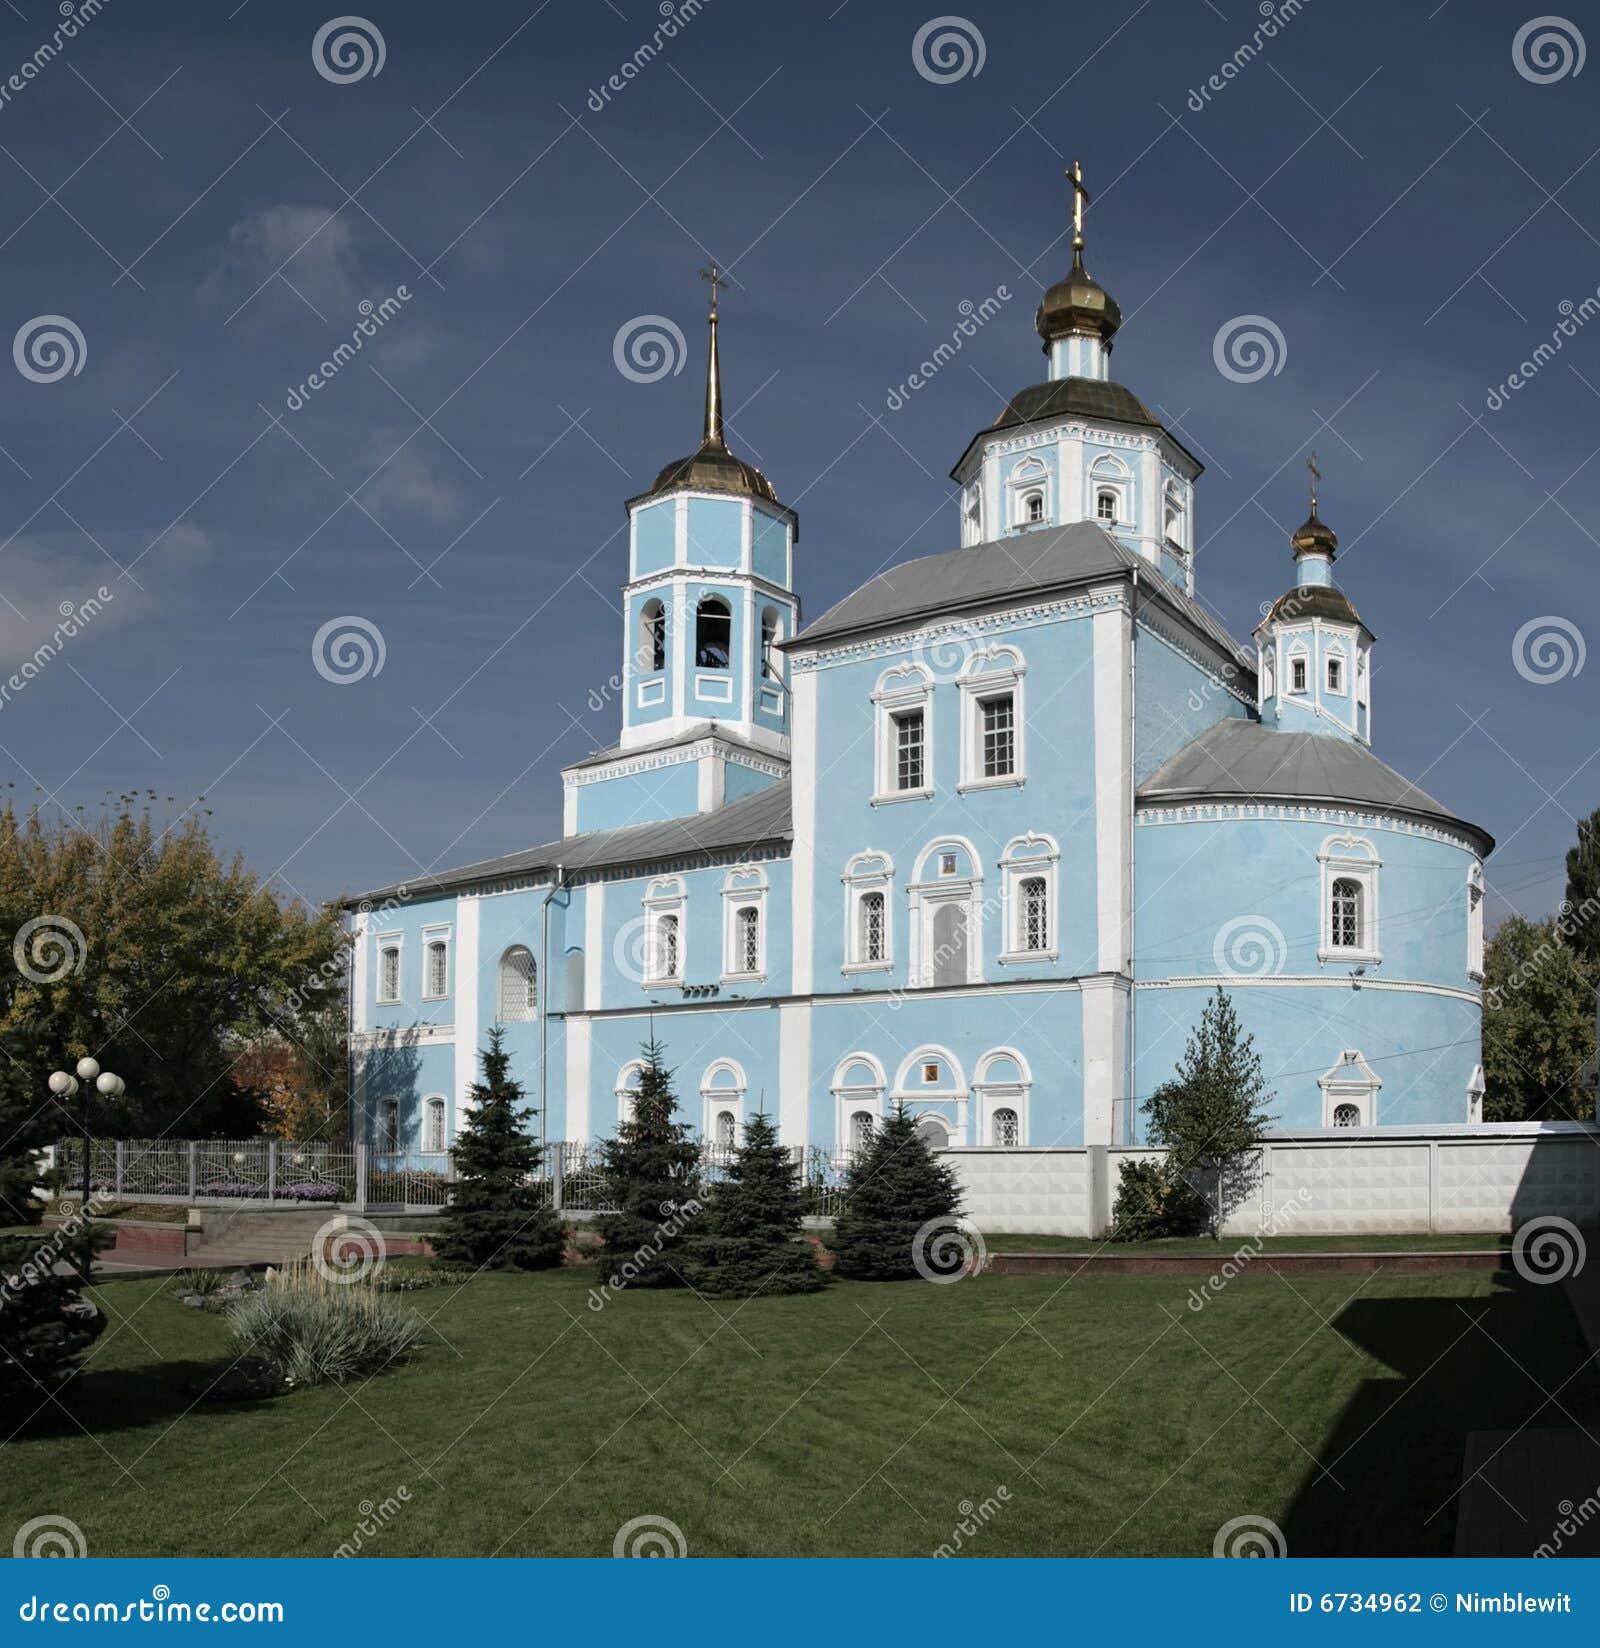 Belgorod Russia  city photos gallery : Smolensky Cathedral. Belgorod. Russia. Stock Photography Image ...